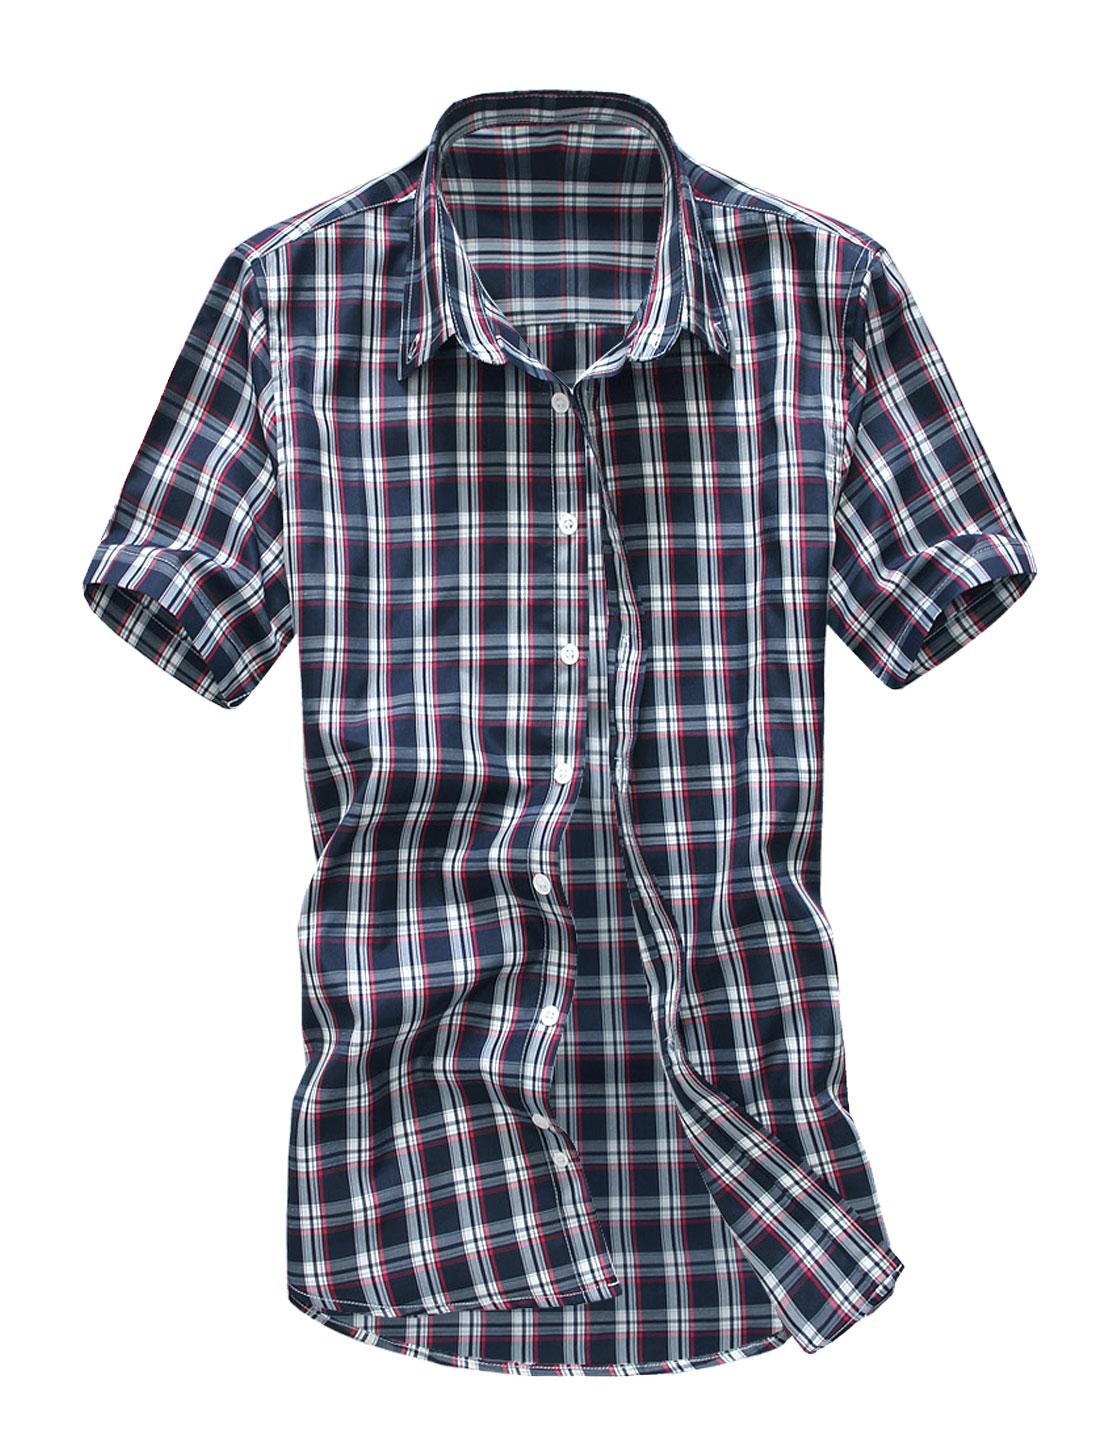 Men Stylish Point Collar Short Sleeve Check Button Down Shirt Navy Blue M